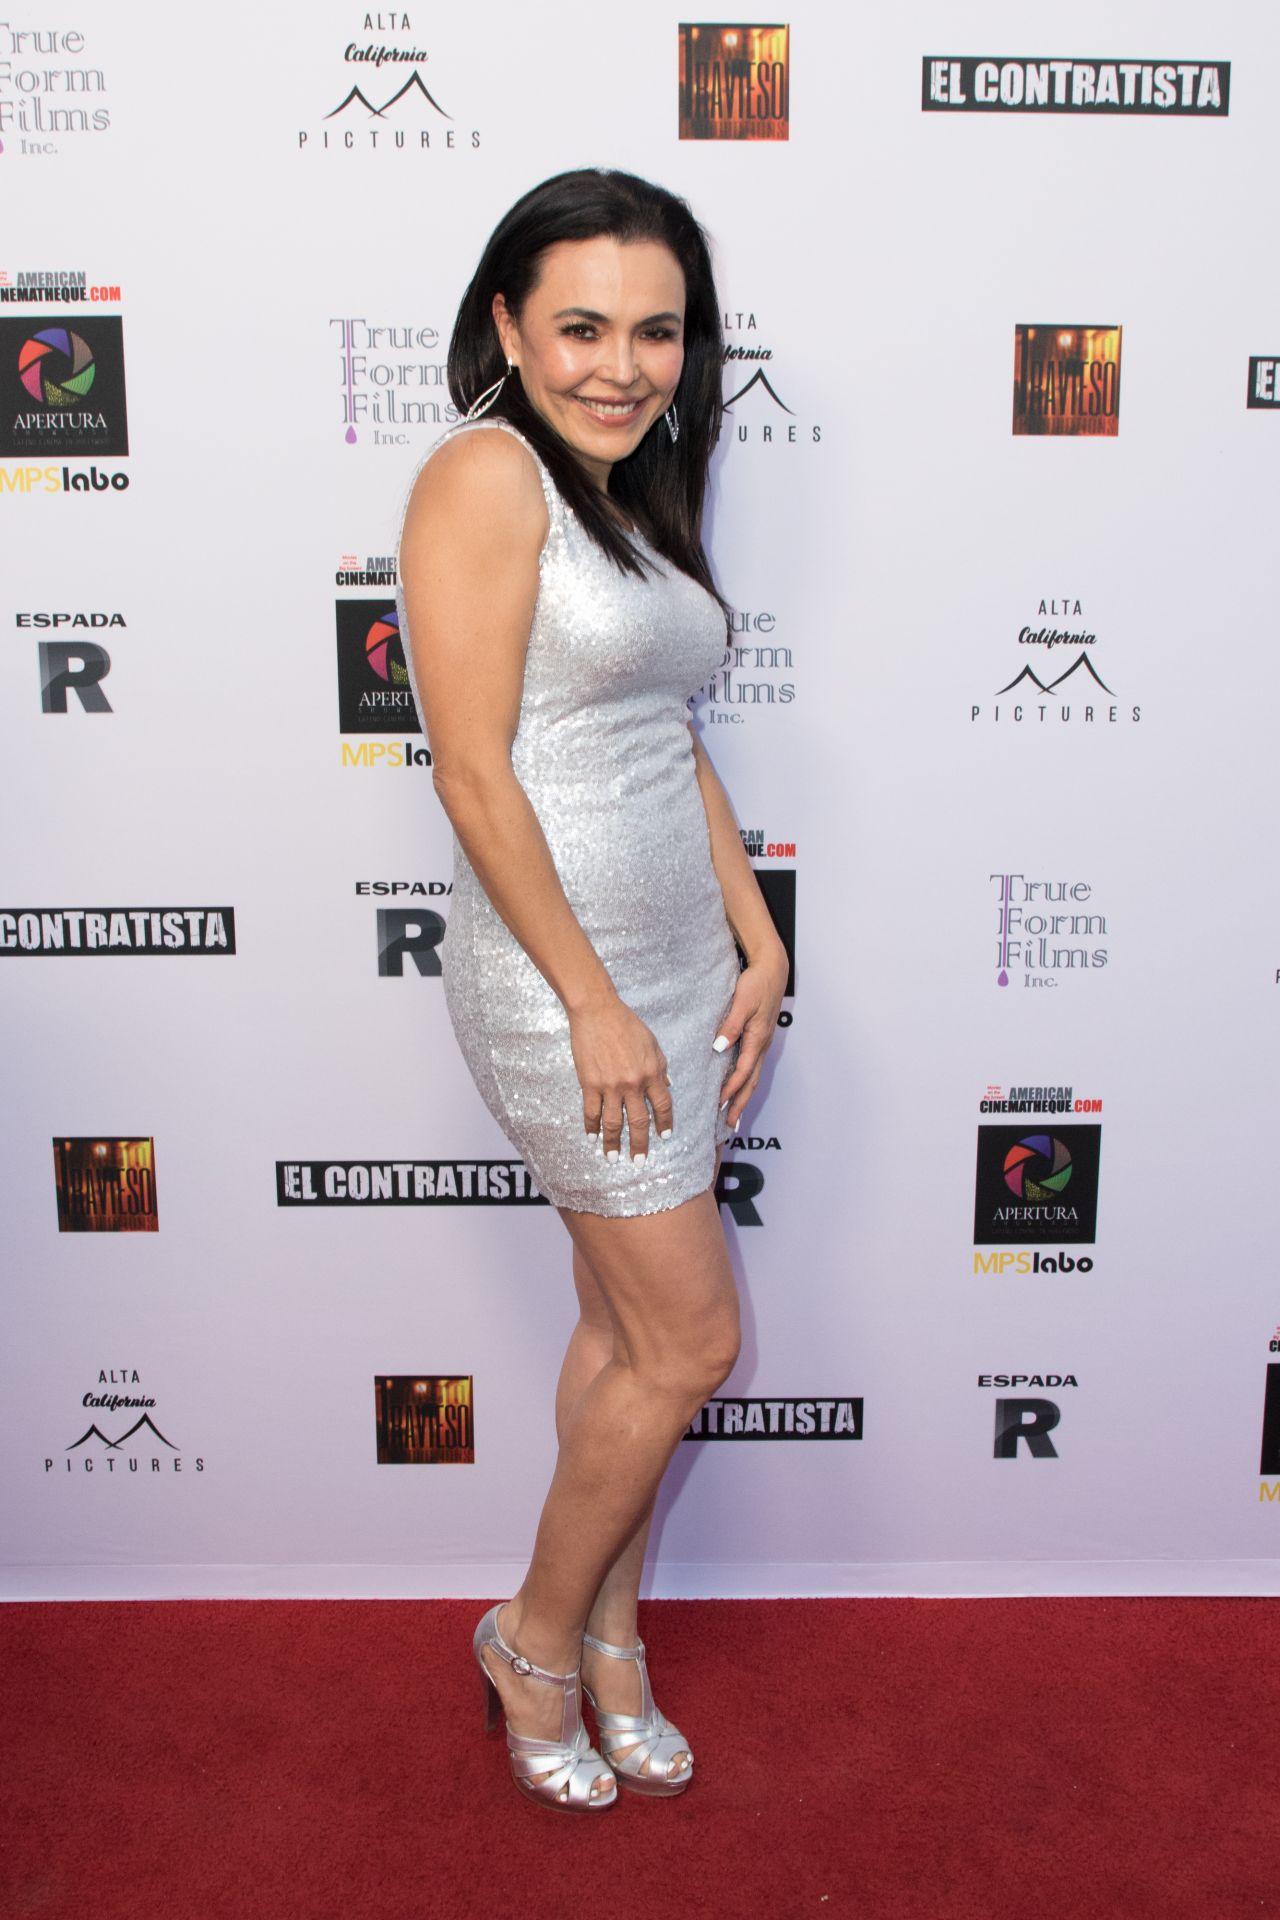 Celebrity sex tape 2018 cast and crew